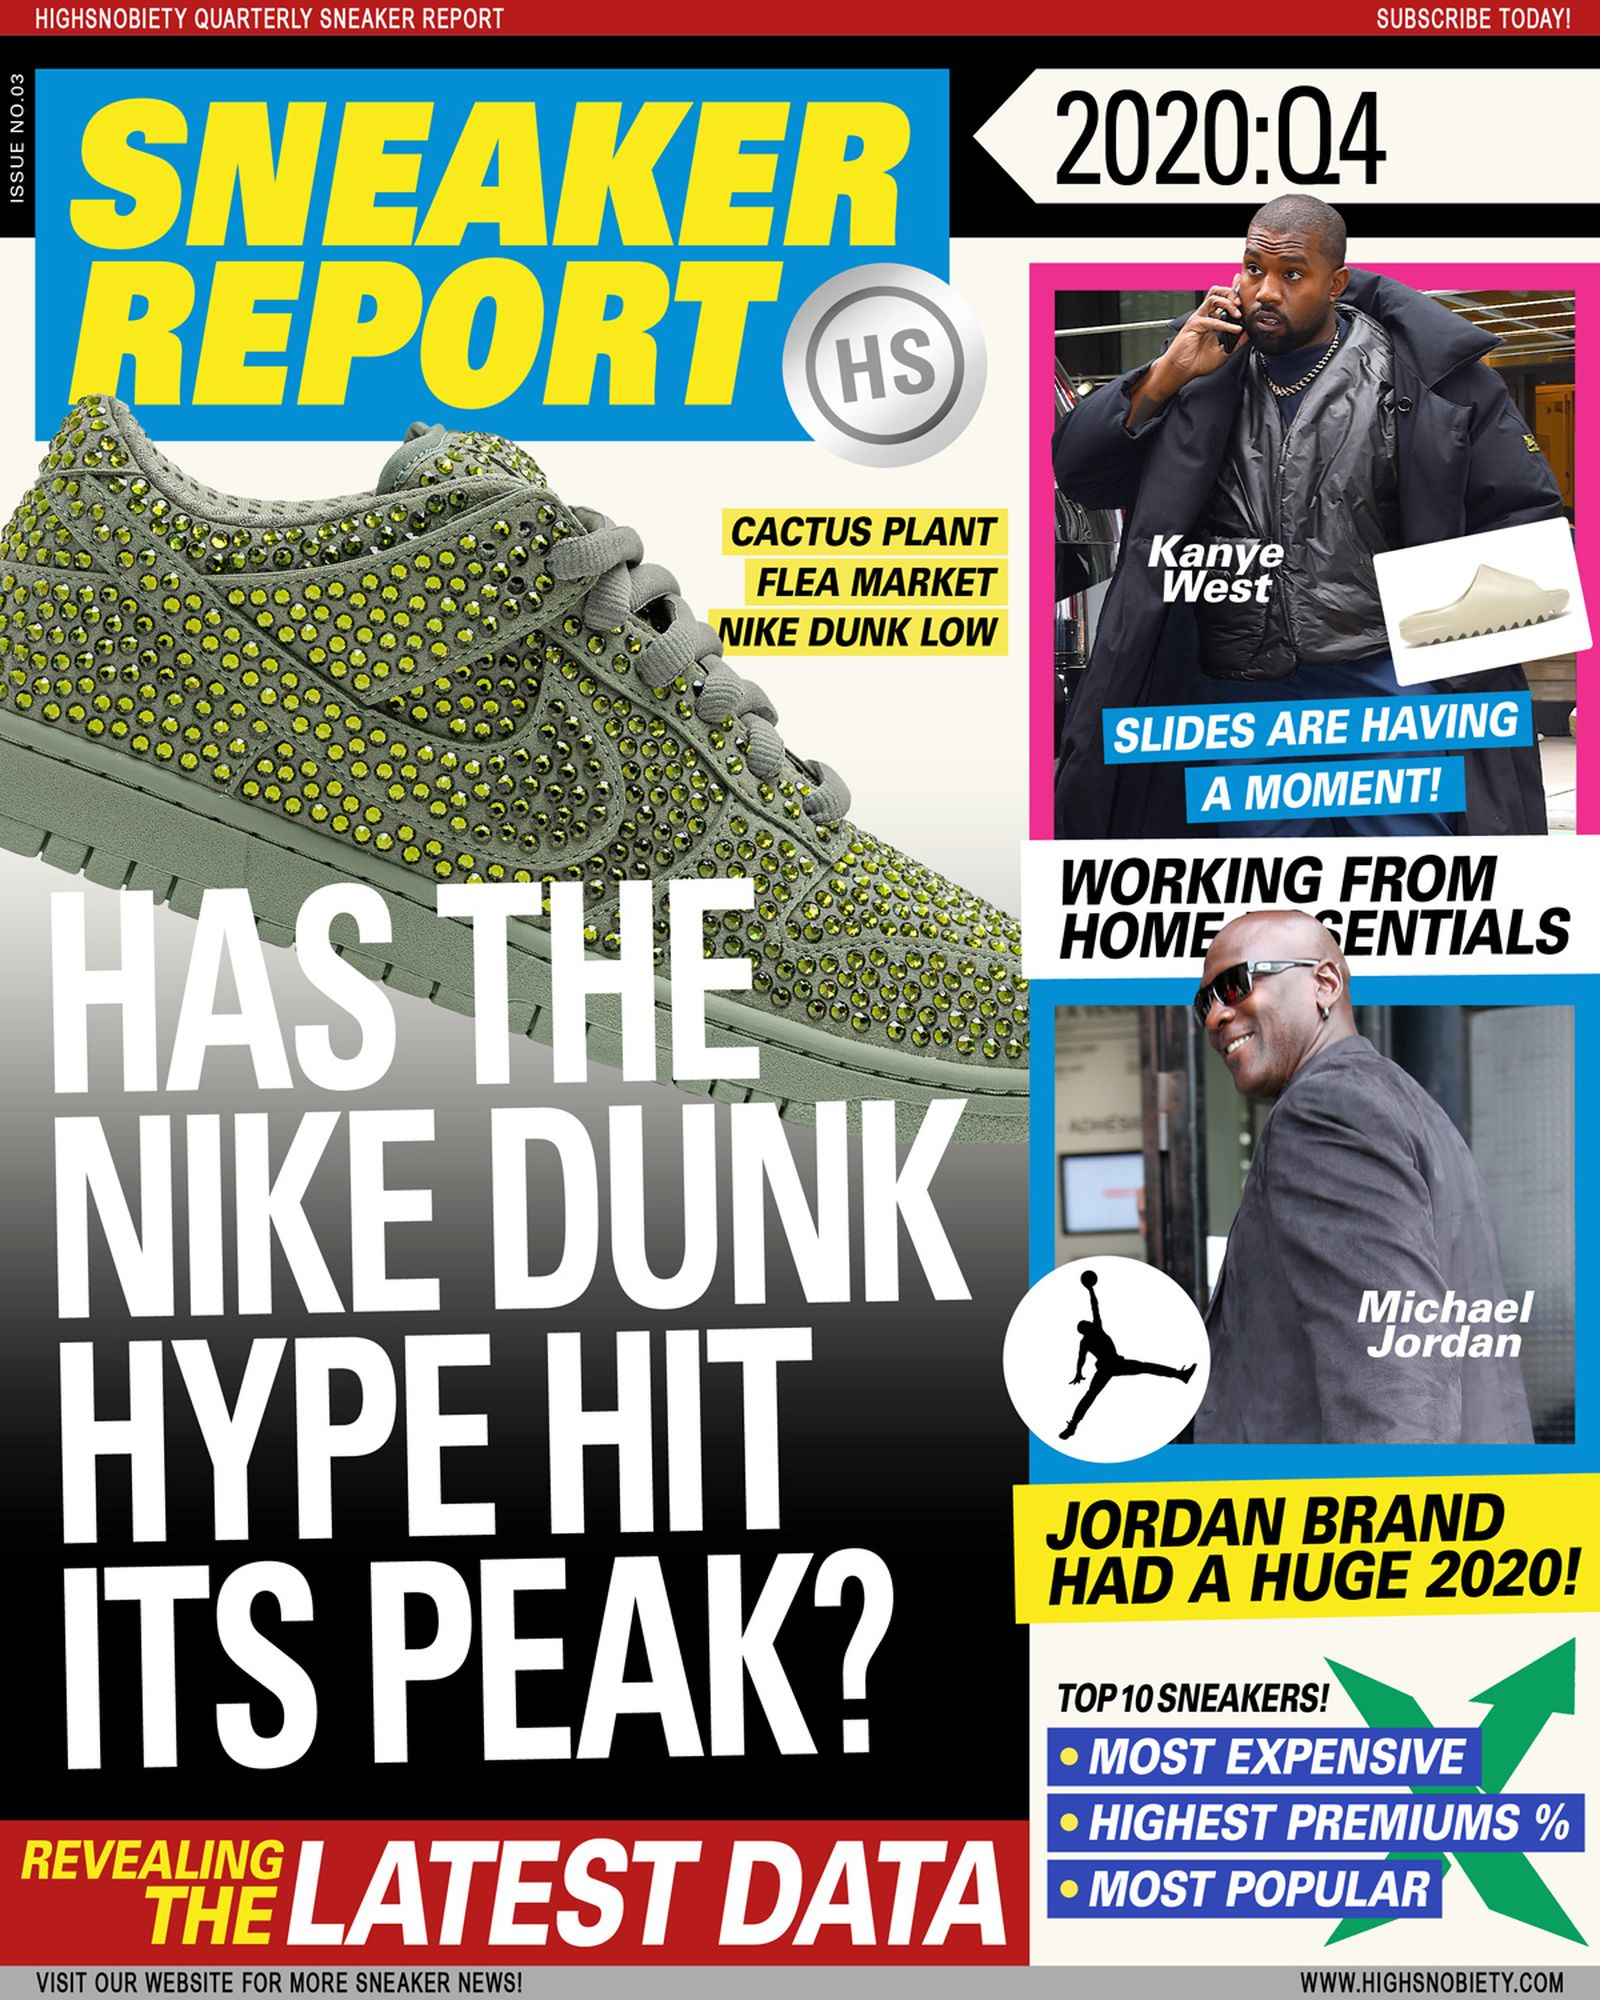 sneaker-report-q4-2020-01